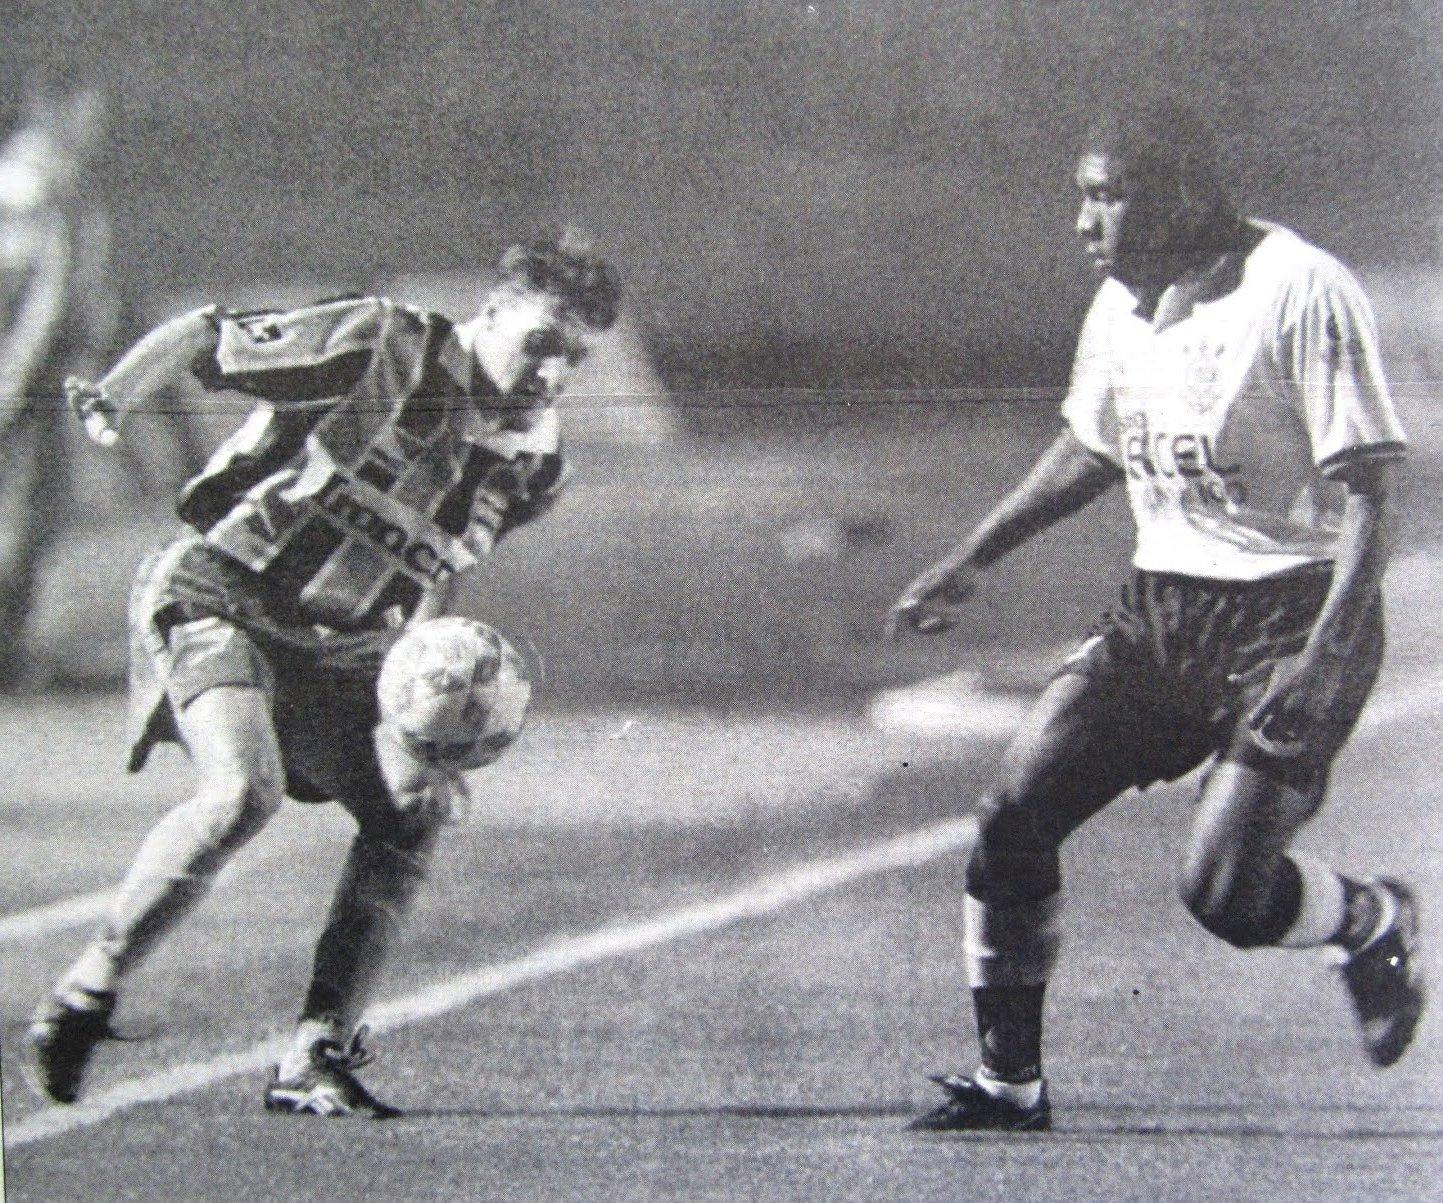 Copa do Brasil 1997: Semifinal - Corinthians 1 x 2 Grêmio